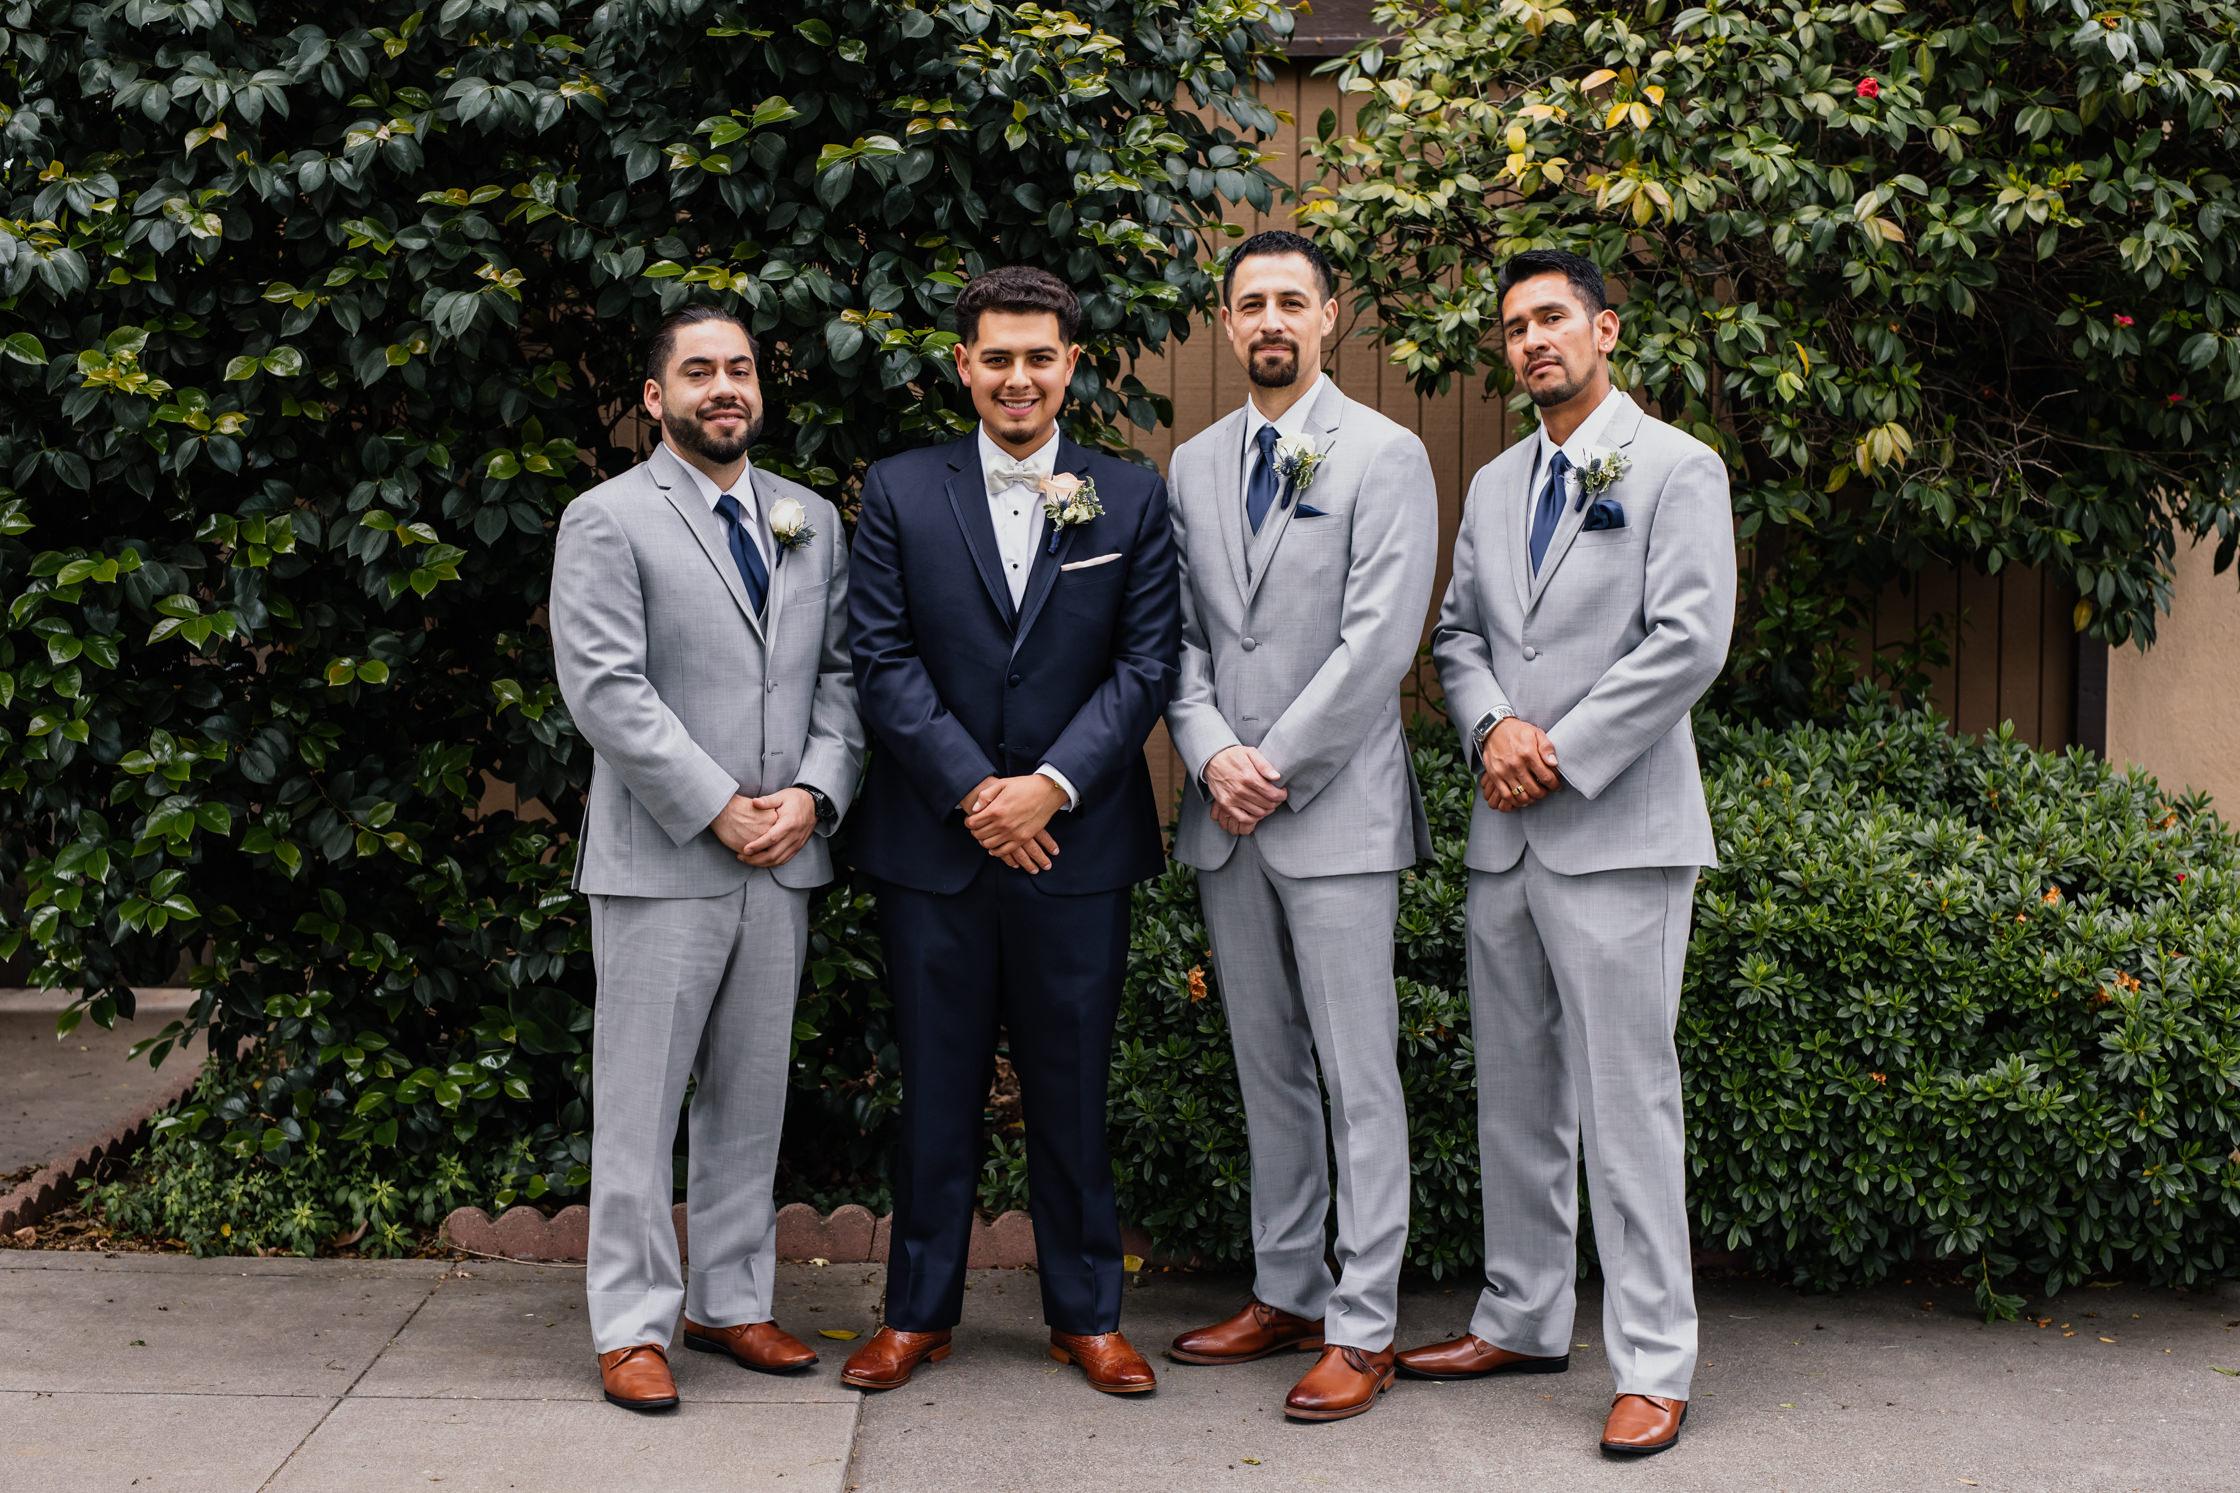 luis_joanna_wedding-3.jpg